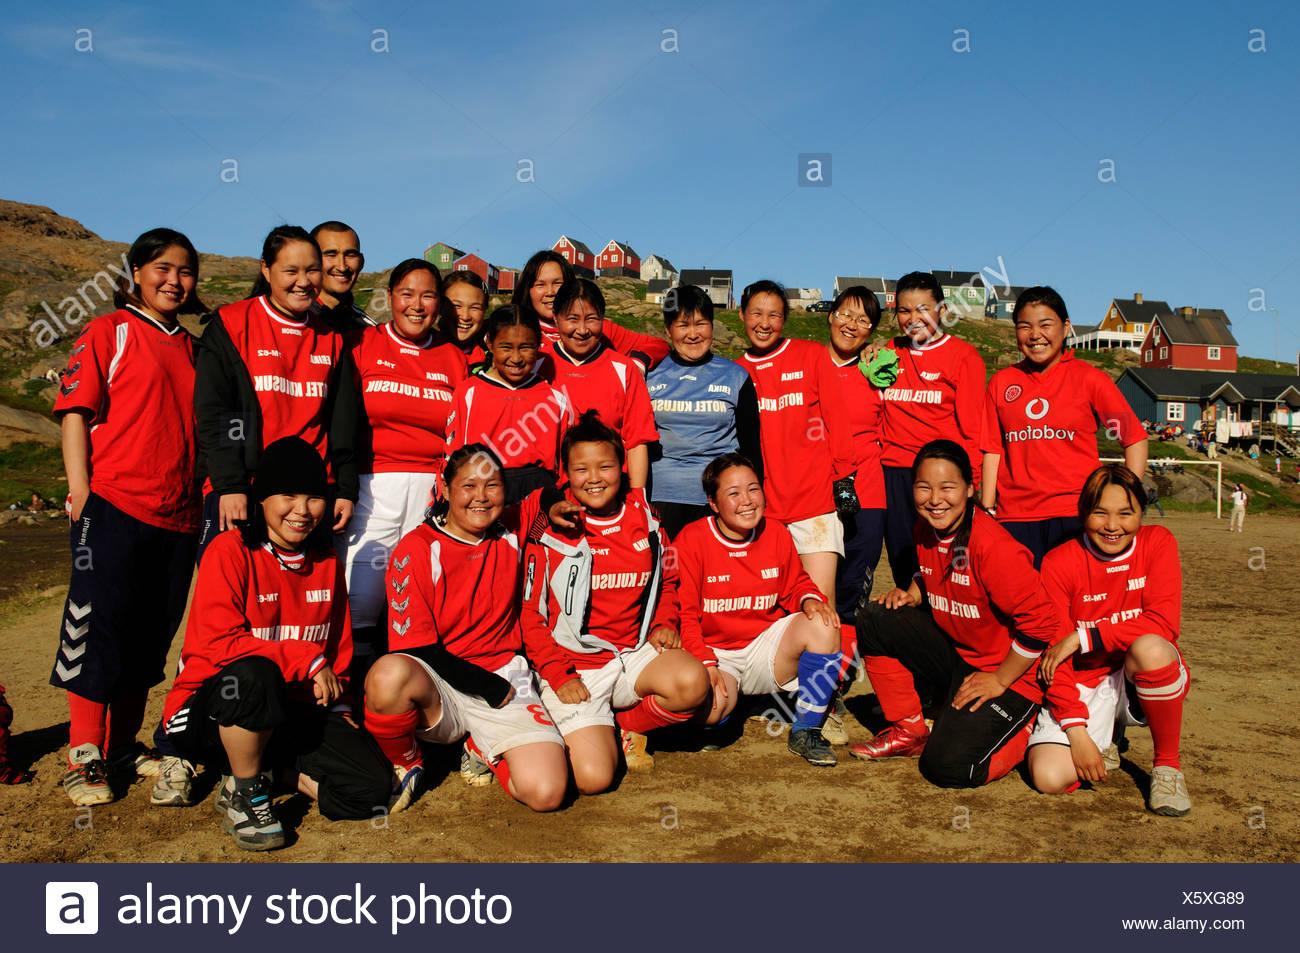 Women's football in Tasiilaq, Ammassalik, East Greenland - Stock Image